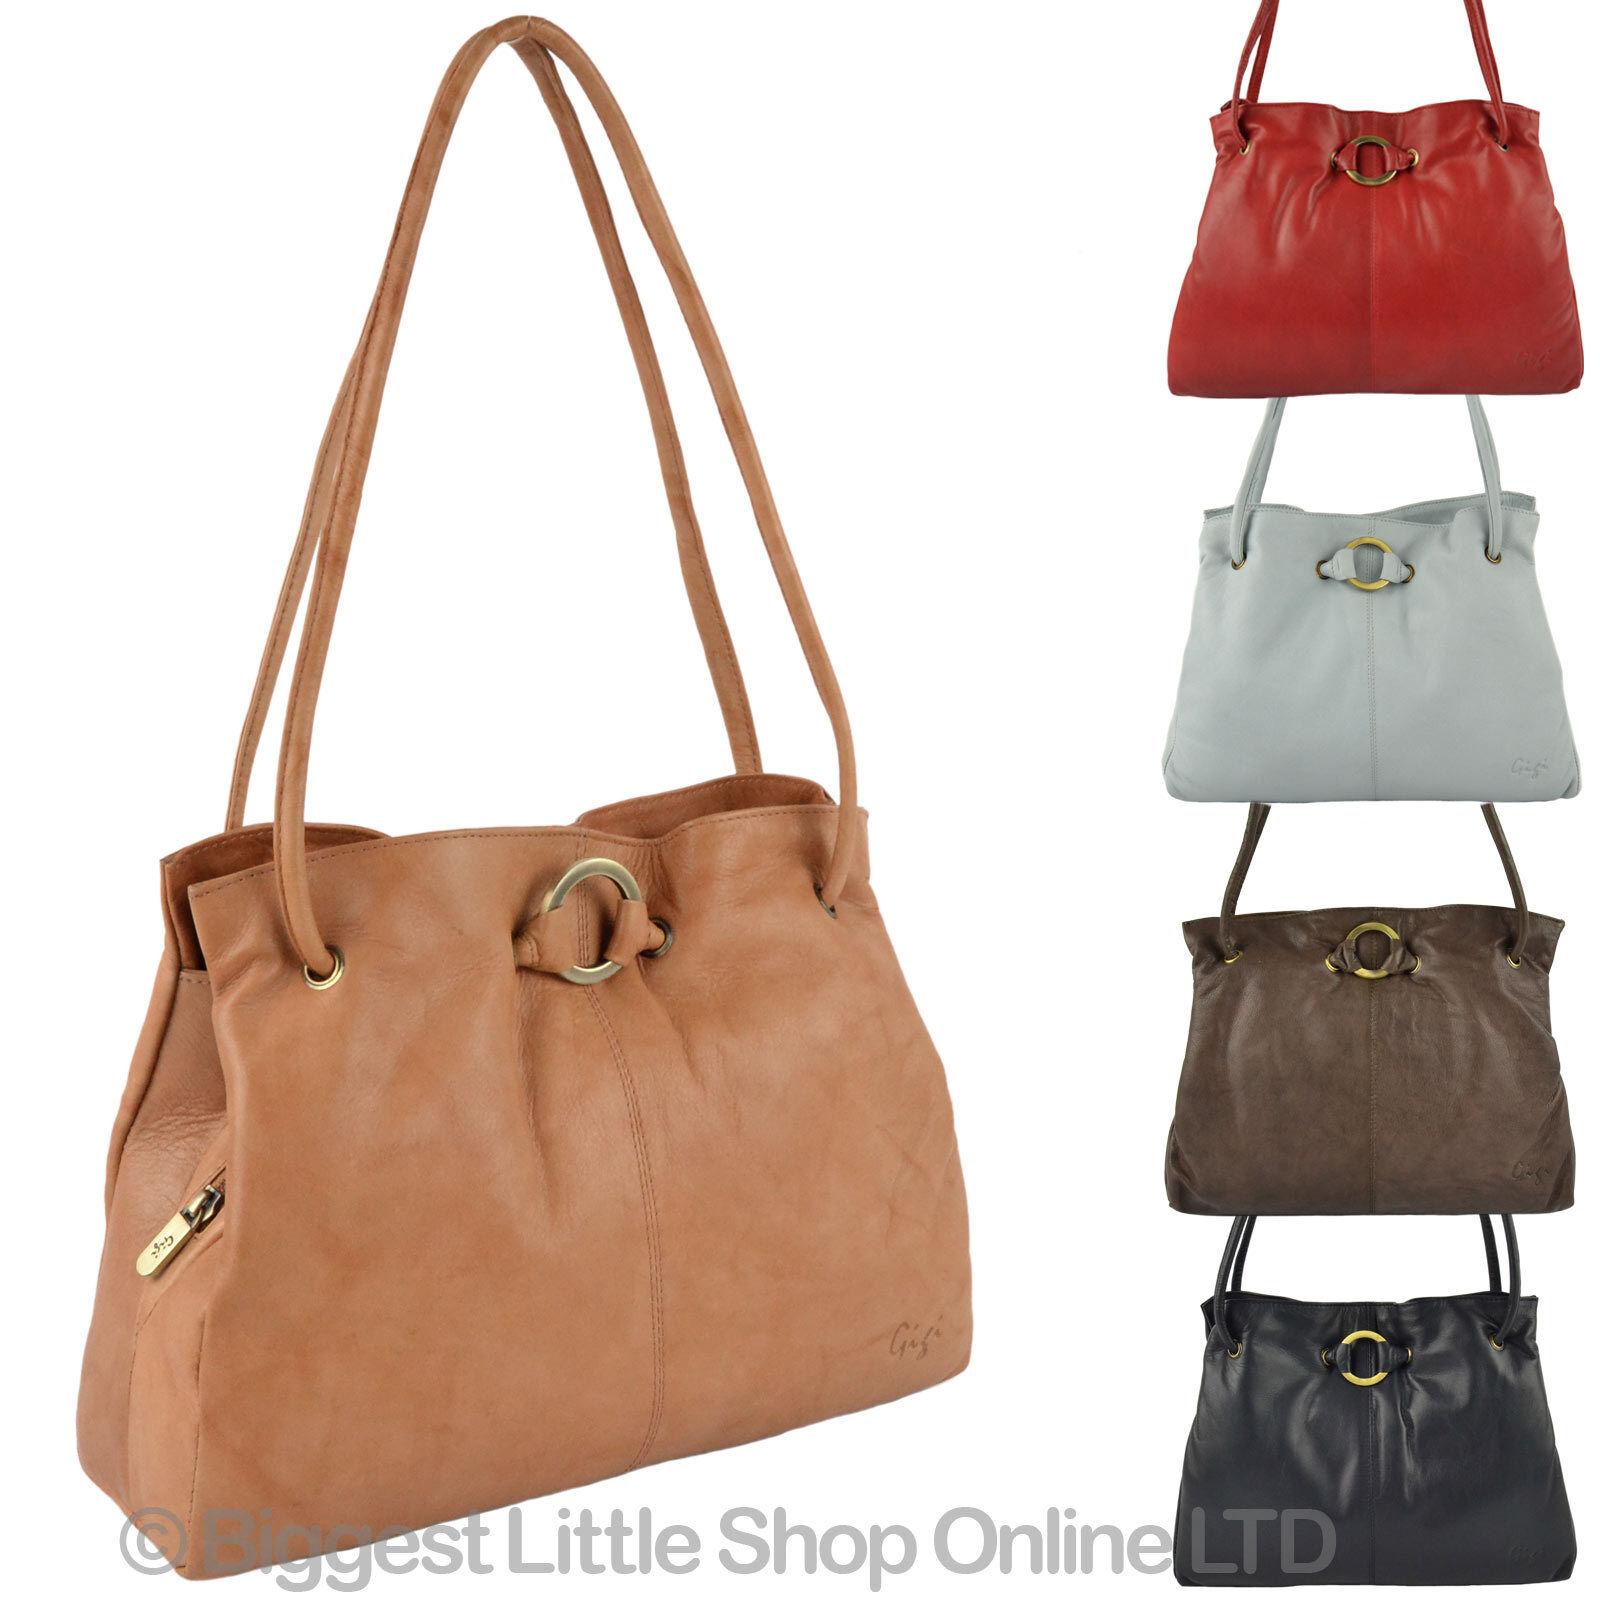 5ddd1cf7e7ad New ladies soft leather shoulder handbag gigi othello collection classic  JPG 1600x1600 Soft leather handbags purses